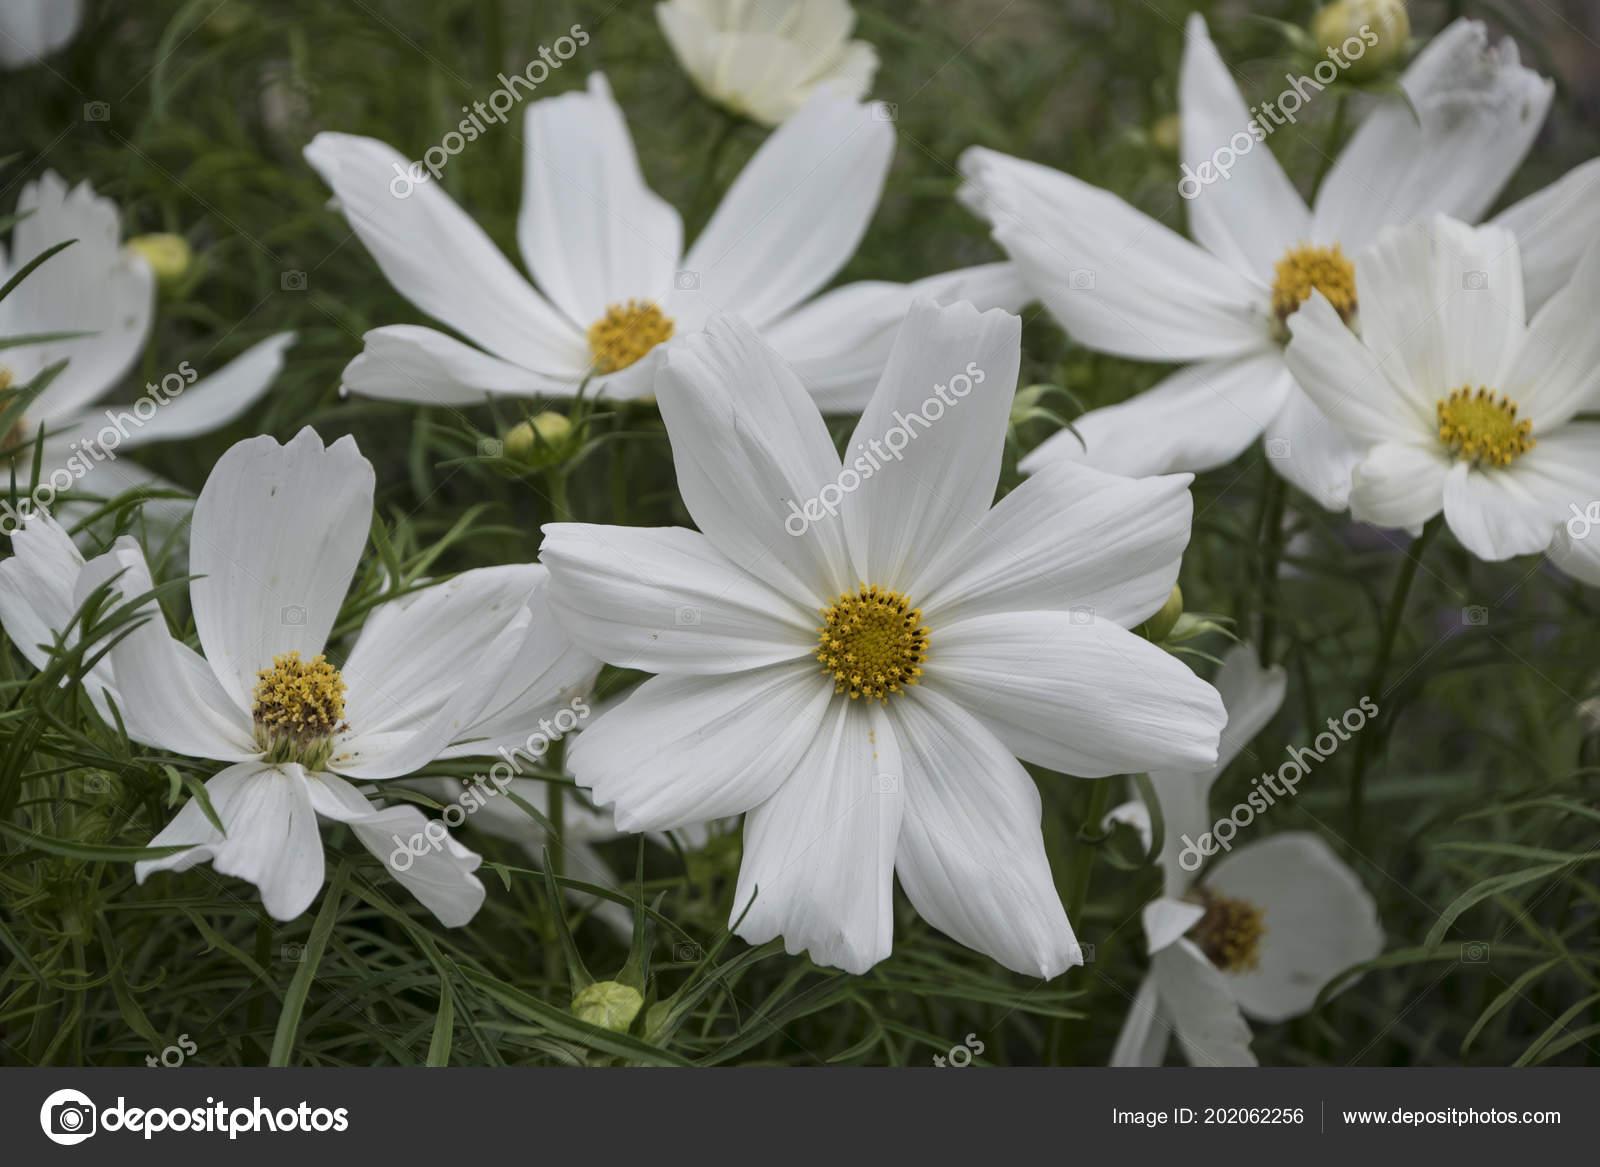 Summer flowers white cosmos flowers latin cosmos bipinnatus stock summer flowers white cosmos flowers latin cosmos bipinnatus stock photo mightylinksfo